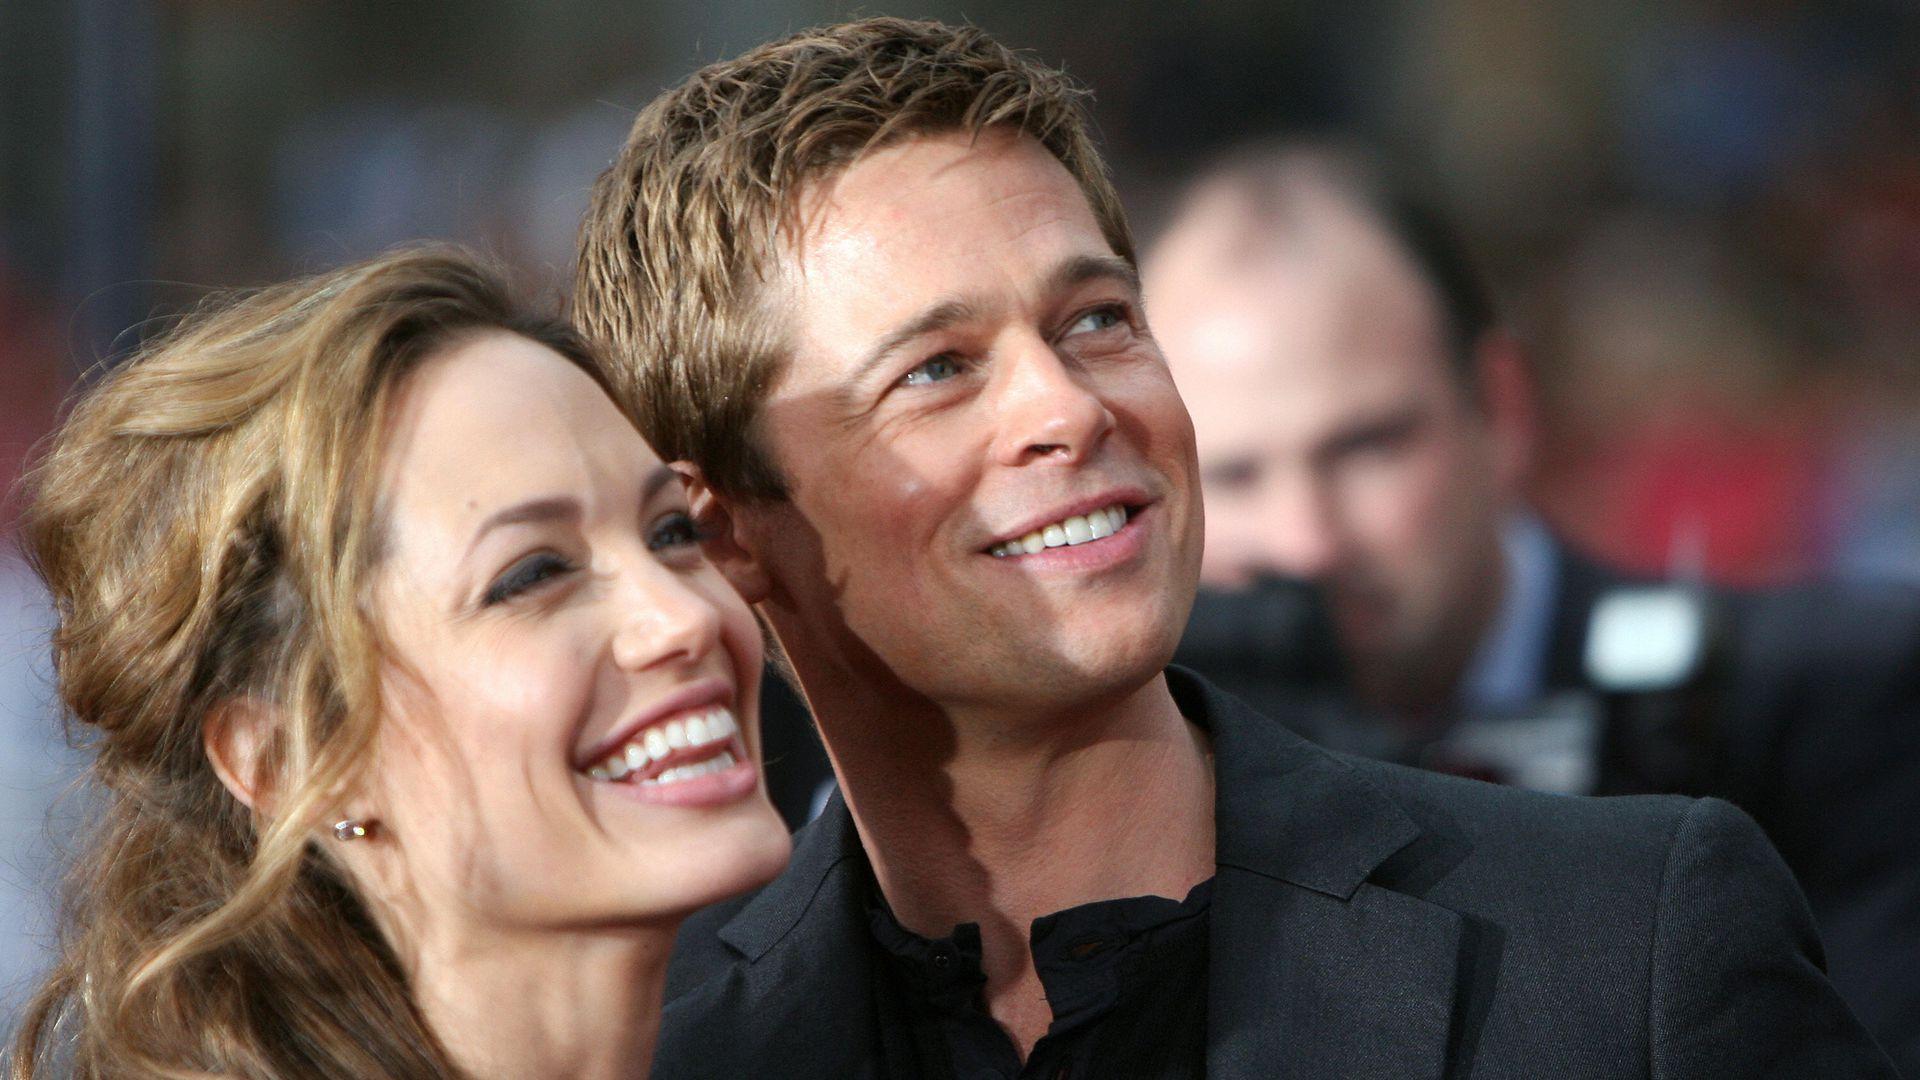 Nackt am Set: So verführte Angelina Jolie damals Brad Pitt